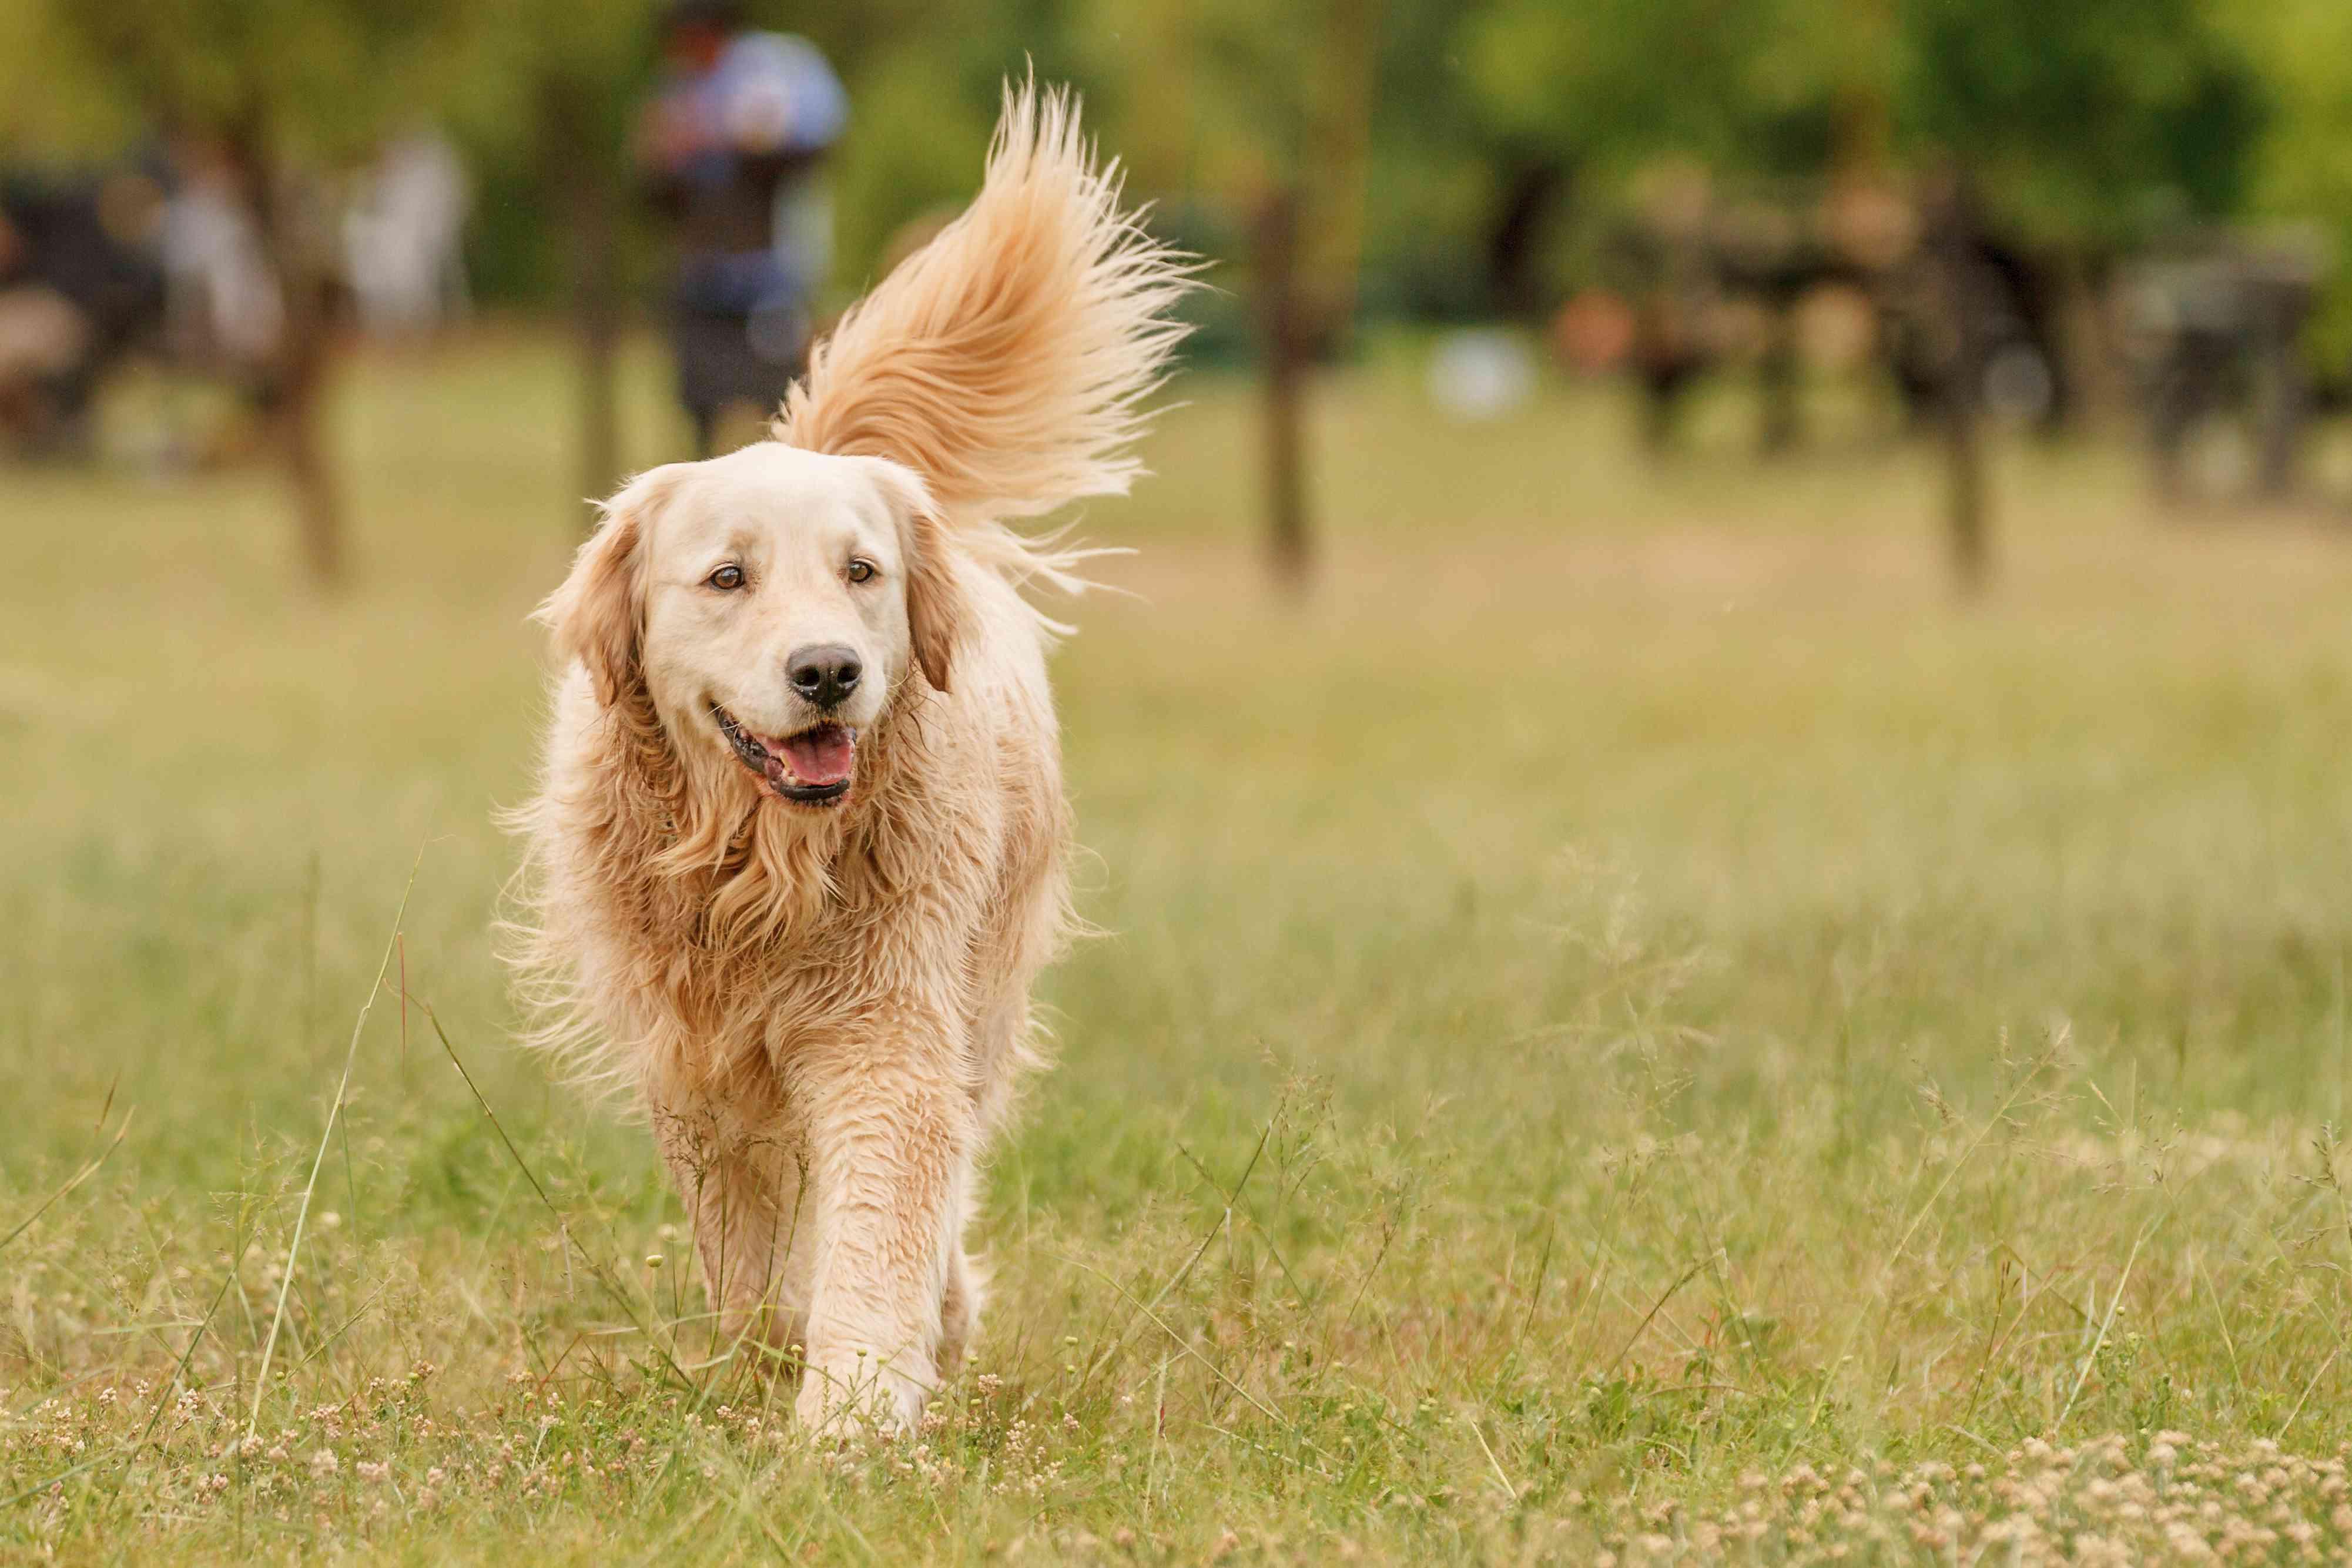 Golden retriever walking through grassy field